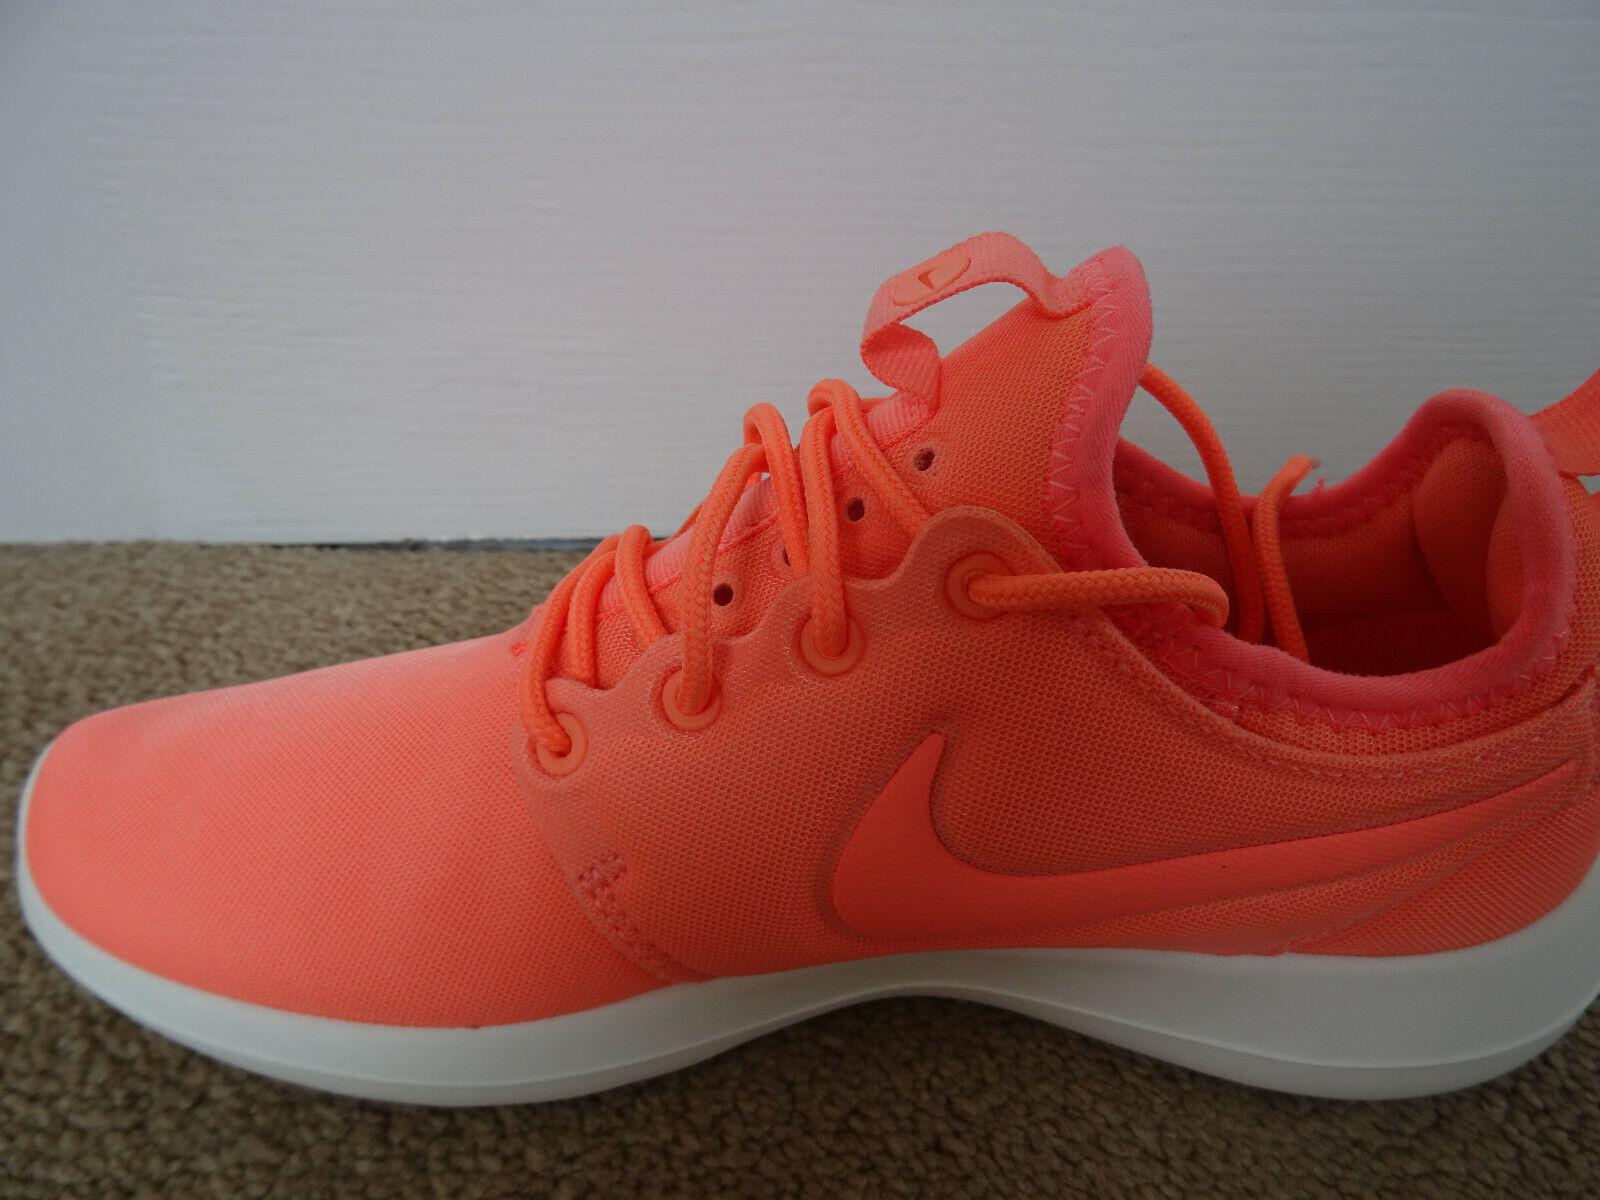 Nike Rosherun Rosherun Rosherun Scarpe Da Ginnastica Da Donna Due 844931 600 EU 36.5 US 6 Nuovo + Scatola ce1a2c